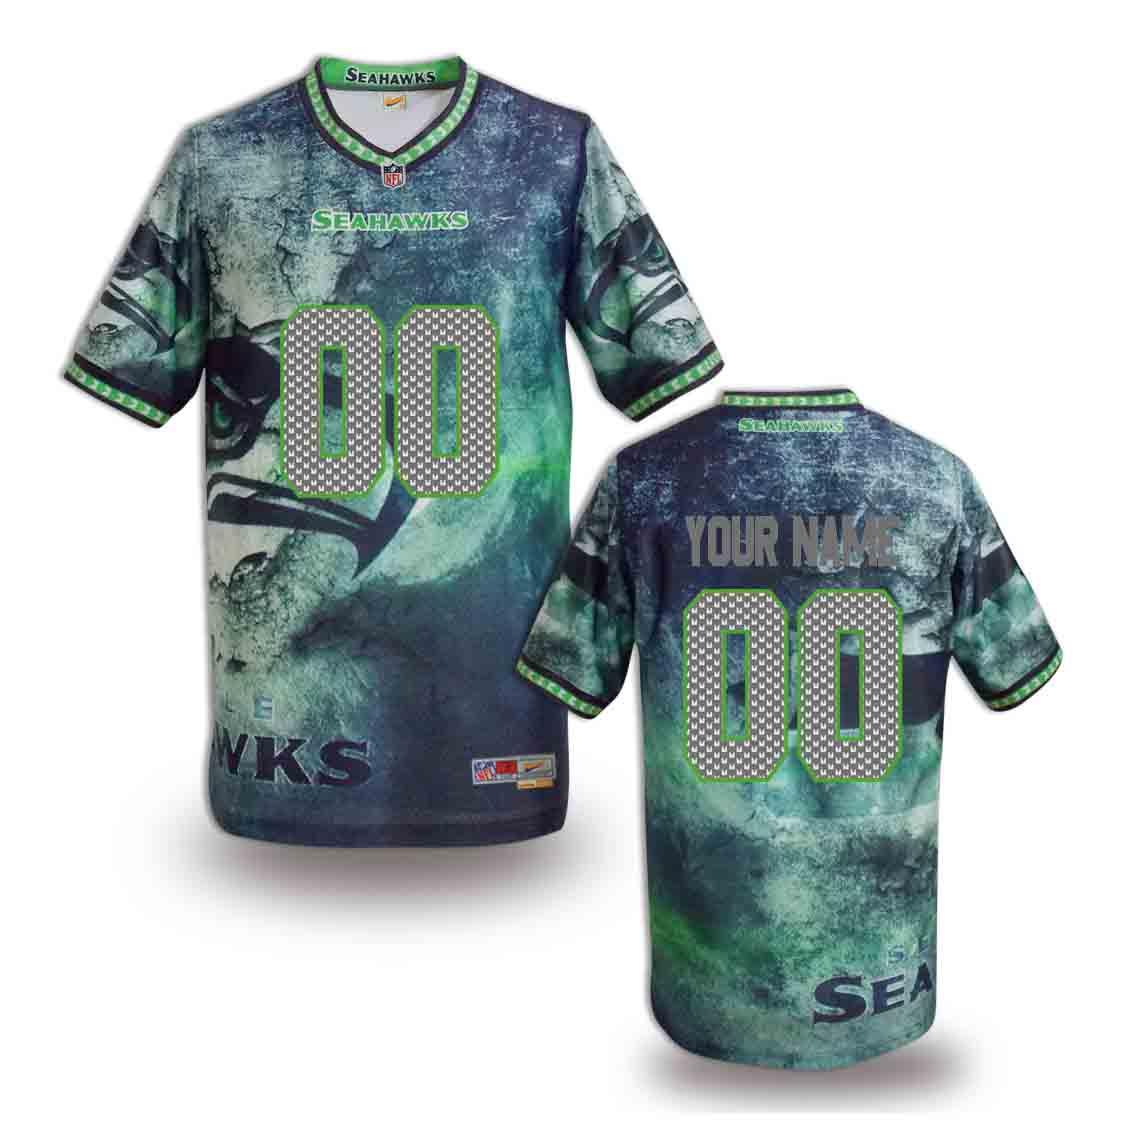 Nike Seahawks Customized Fashion Stitched Jerseys13